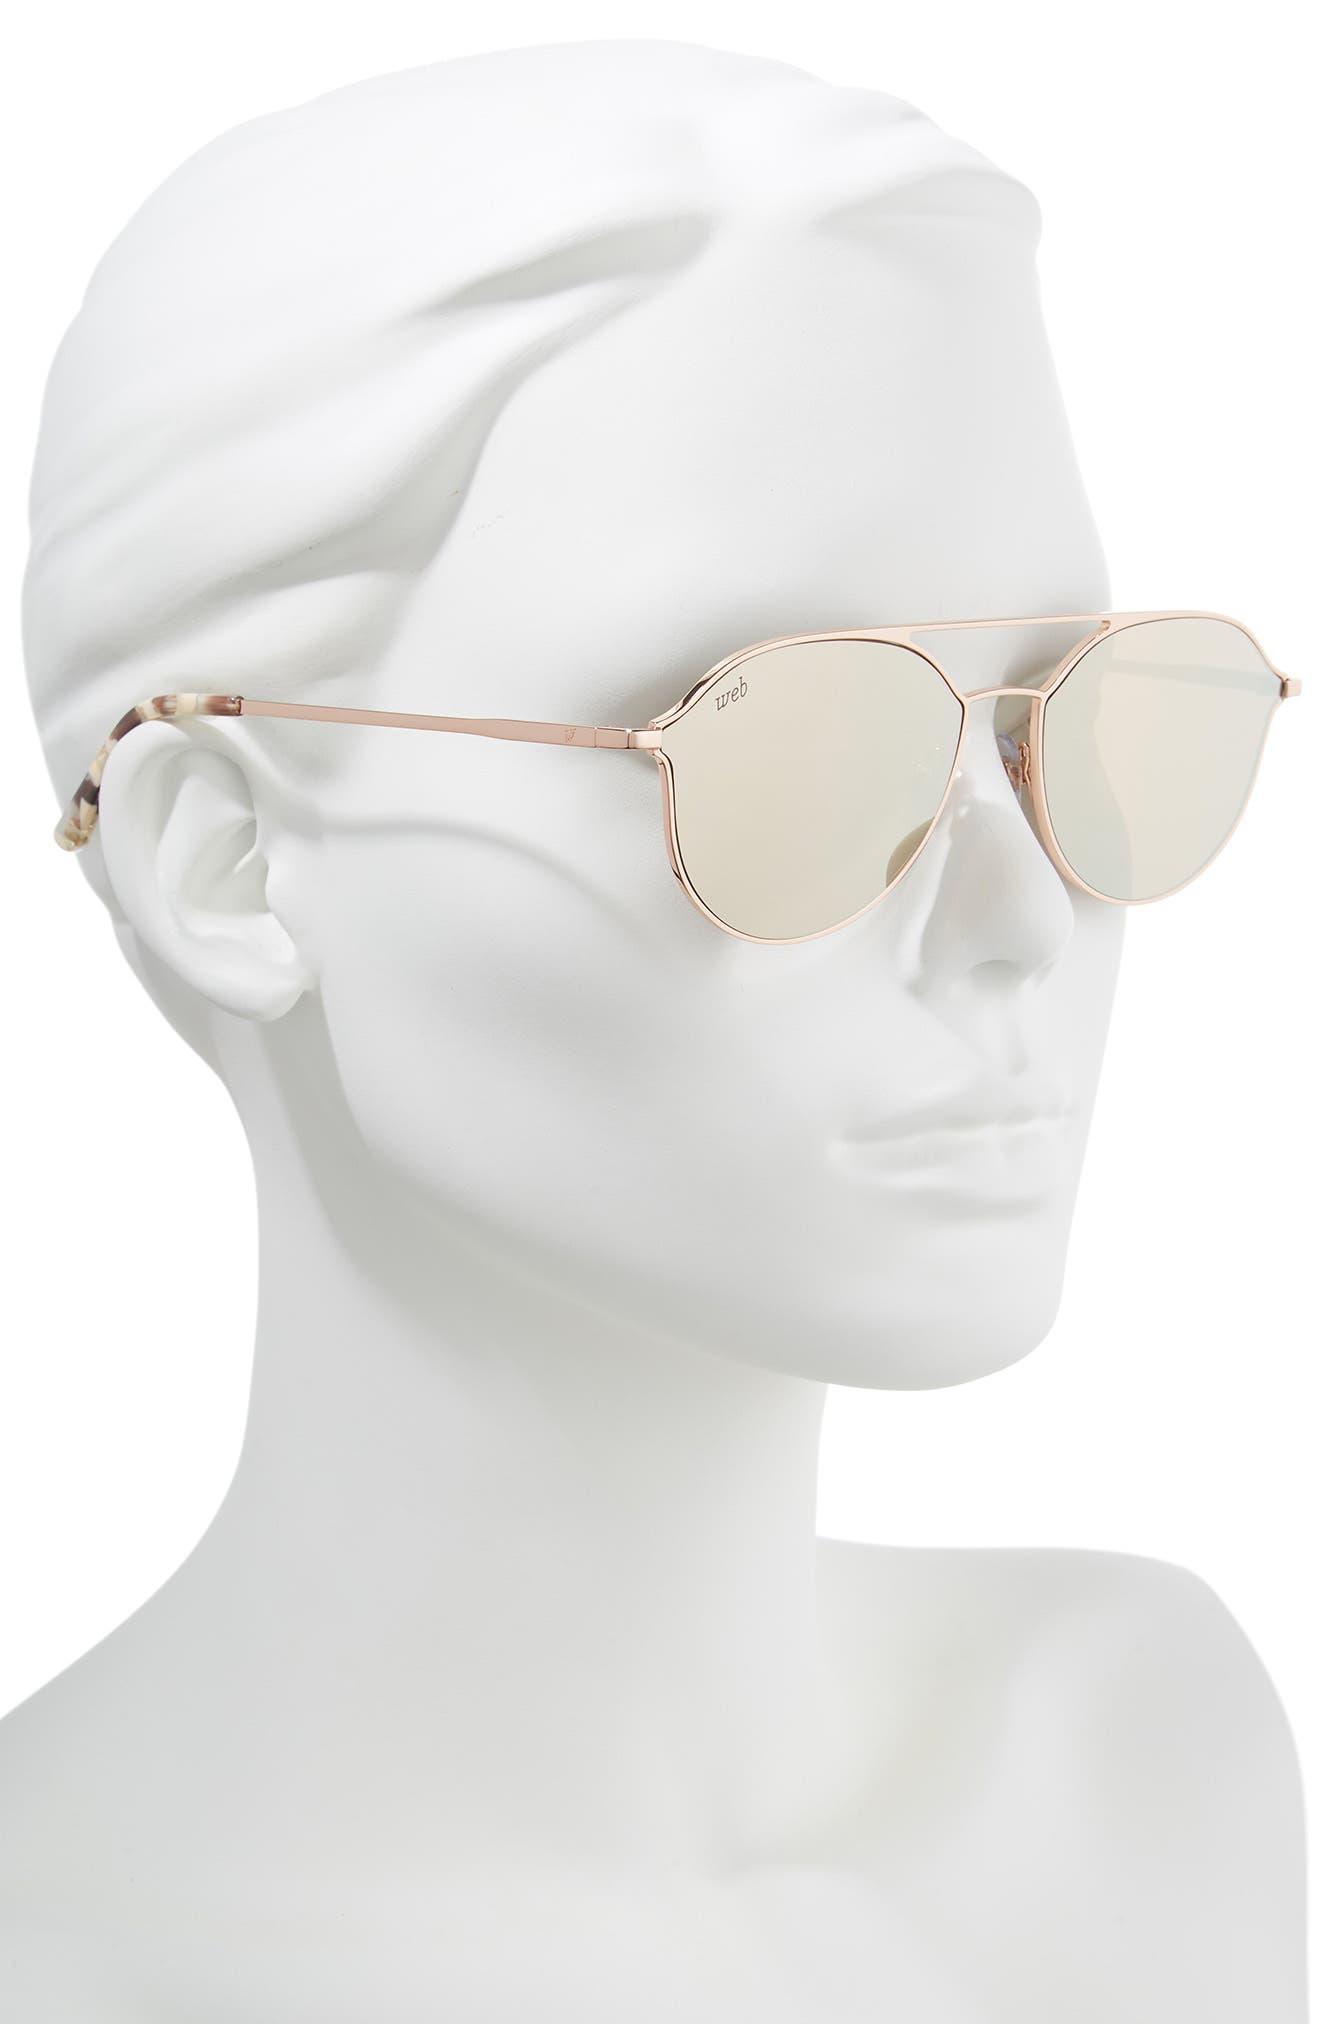 59mm Metal Aviator Sunglasses,                             Alternate thumbnail 2, color,                             LIGHT BRONZE/ BROWN